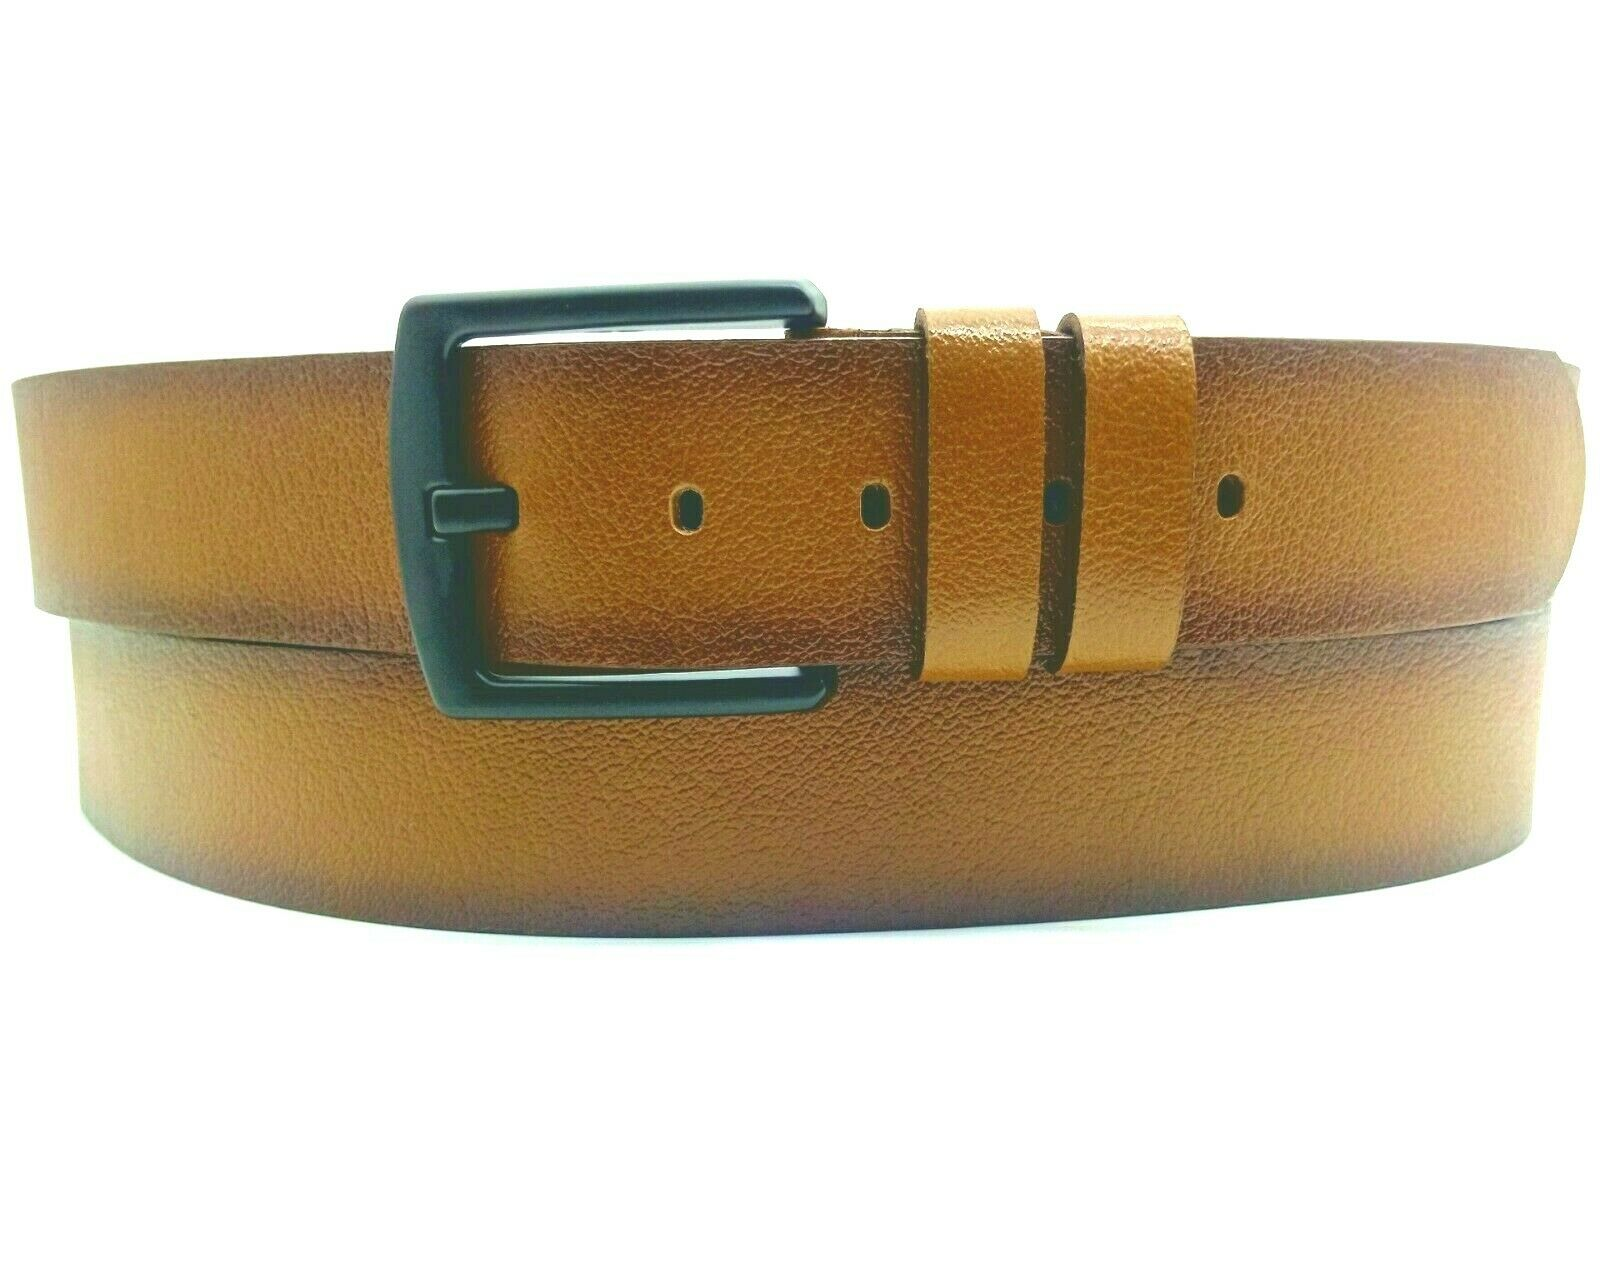 100% Echte Büffelleder Belt 4cm Breit Handmade Gürtel Cognag Braun Schwarz ✅